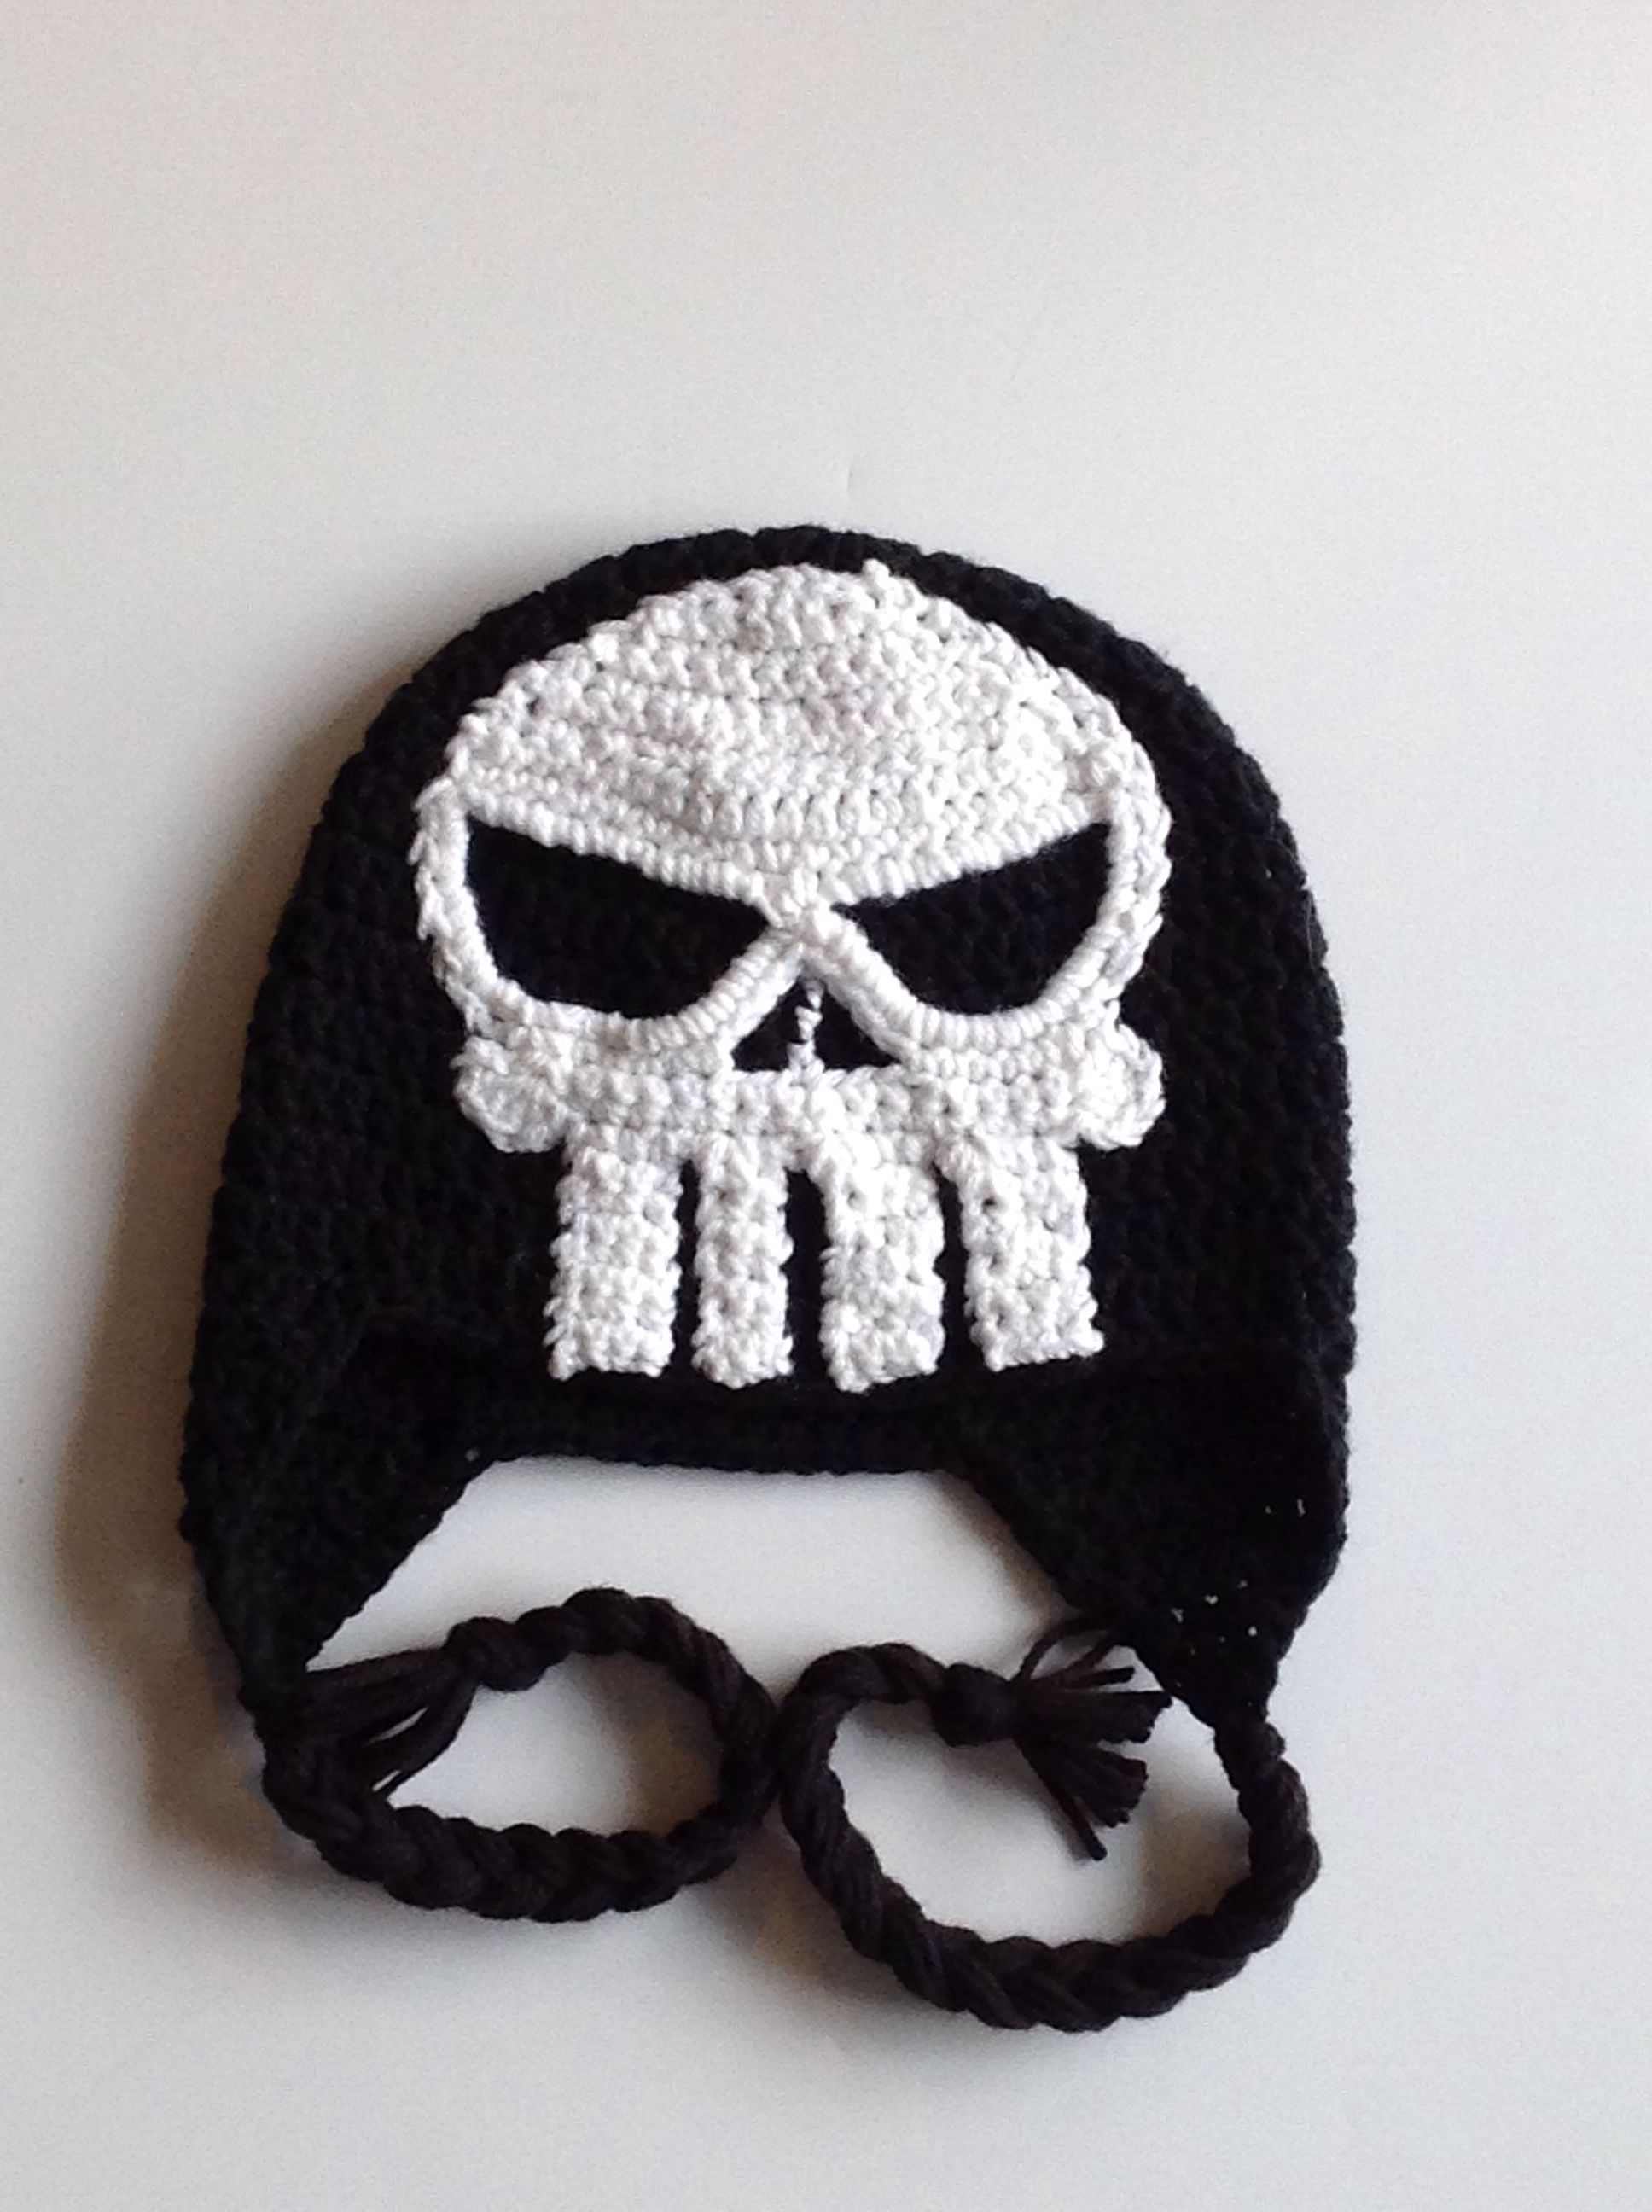 Pin by Melissa Frank on Crochet wearables I\'ve created | Pinterest ...